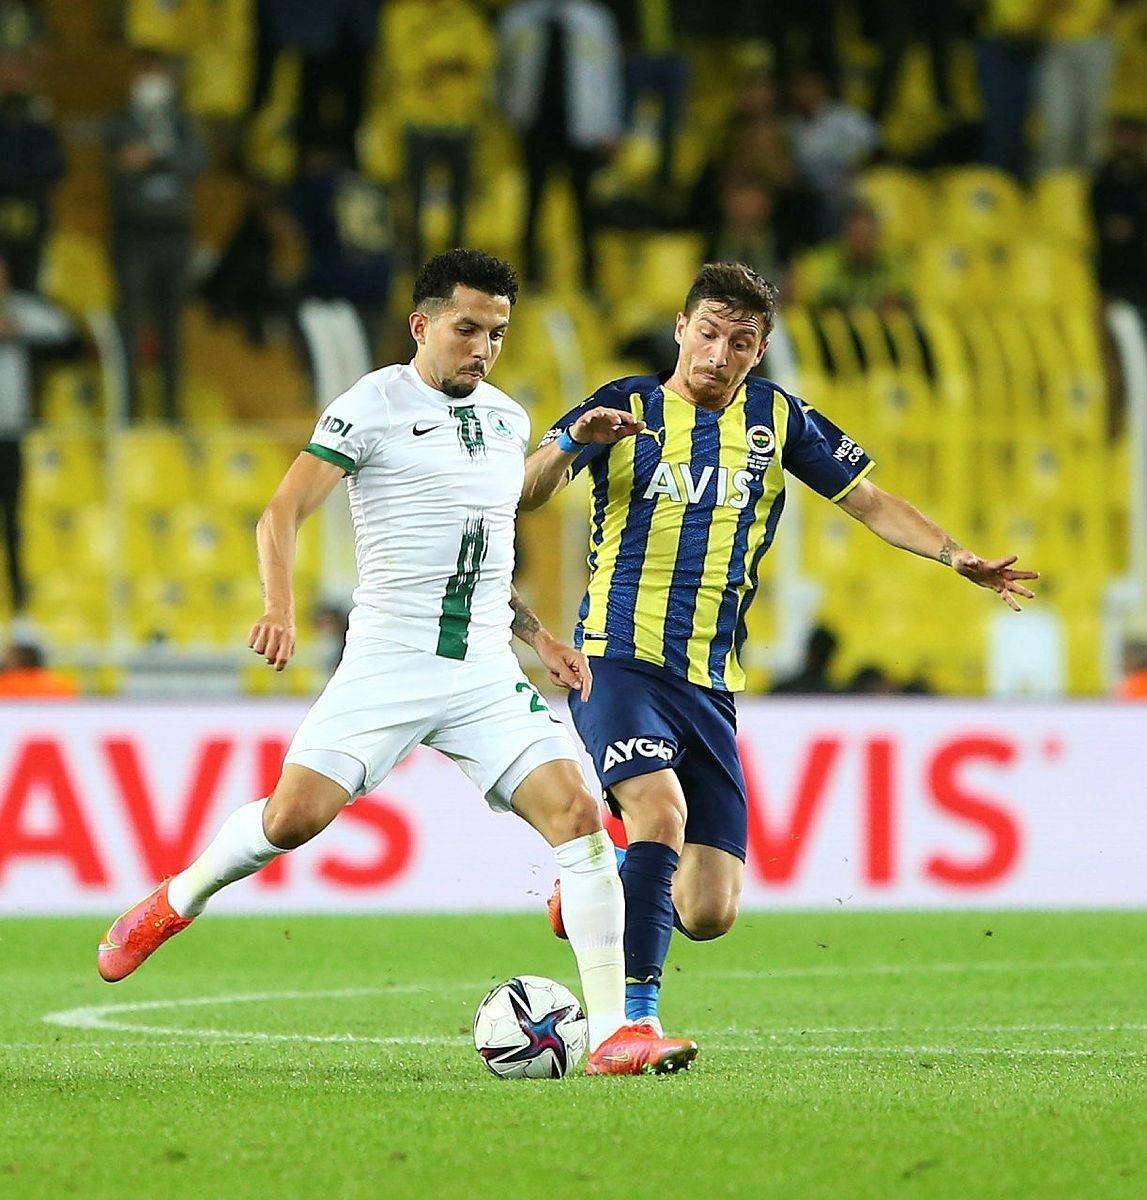 Mert Hakan Yandaş, Vitor Pereira yı sevindirdi #1